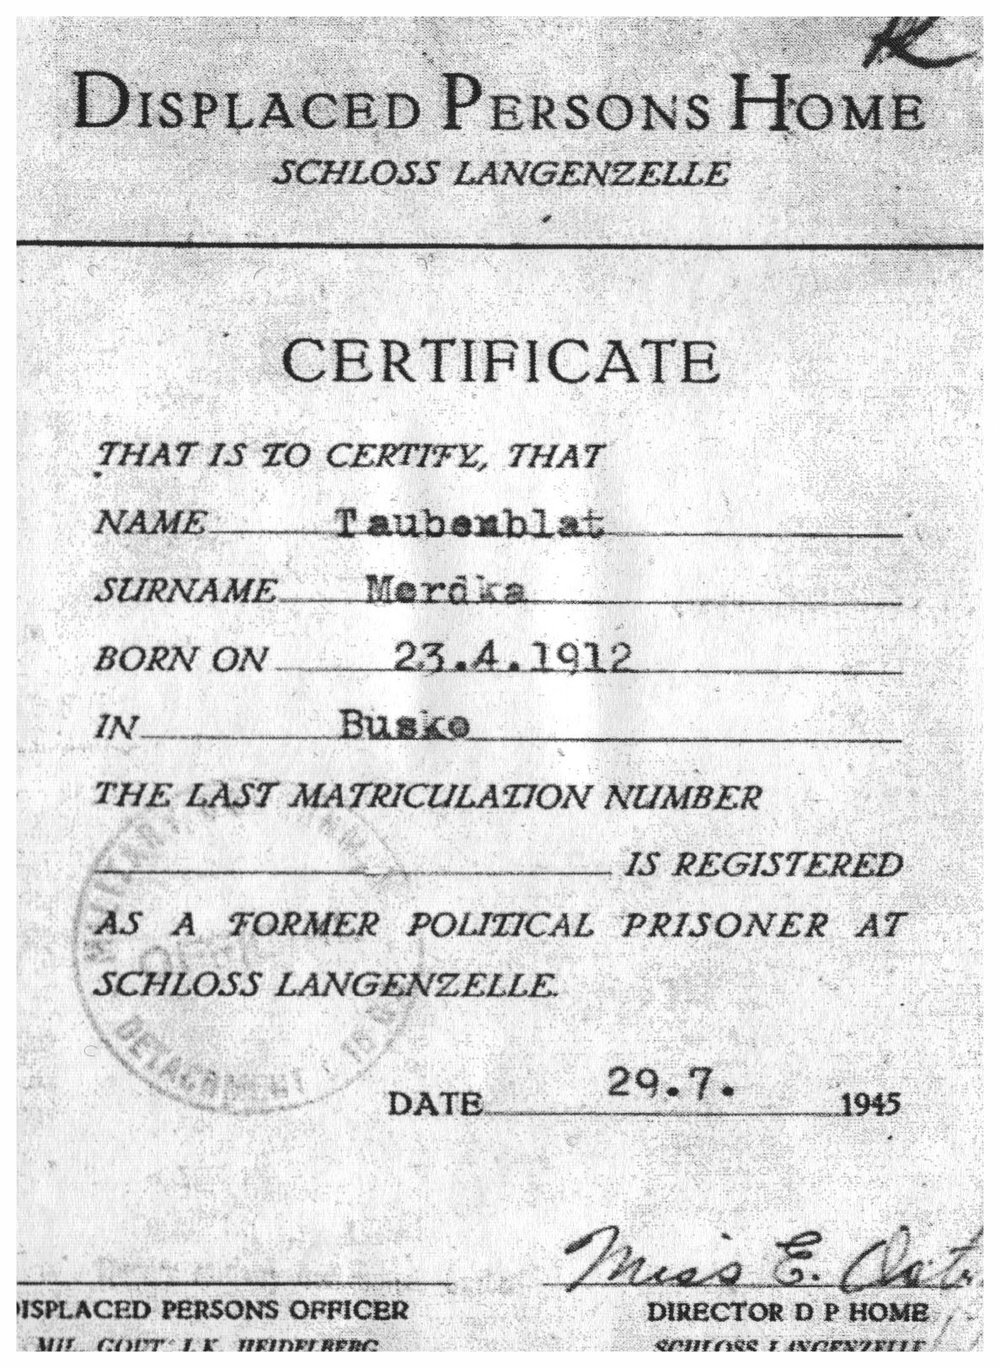 Certificate of registration at post-war DP camp